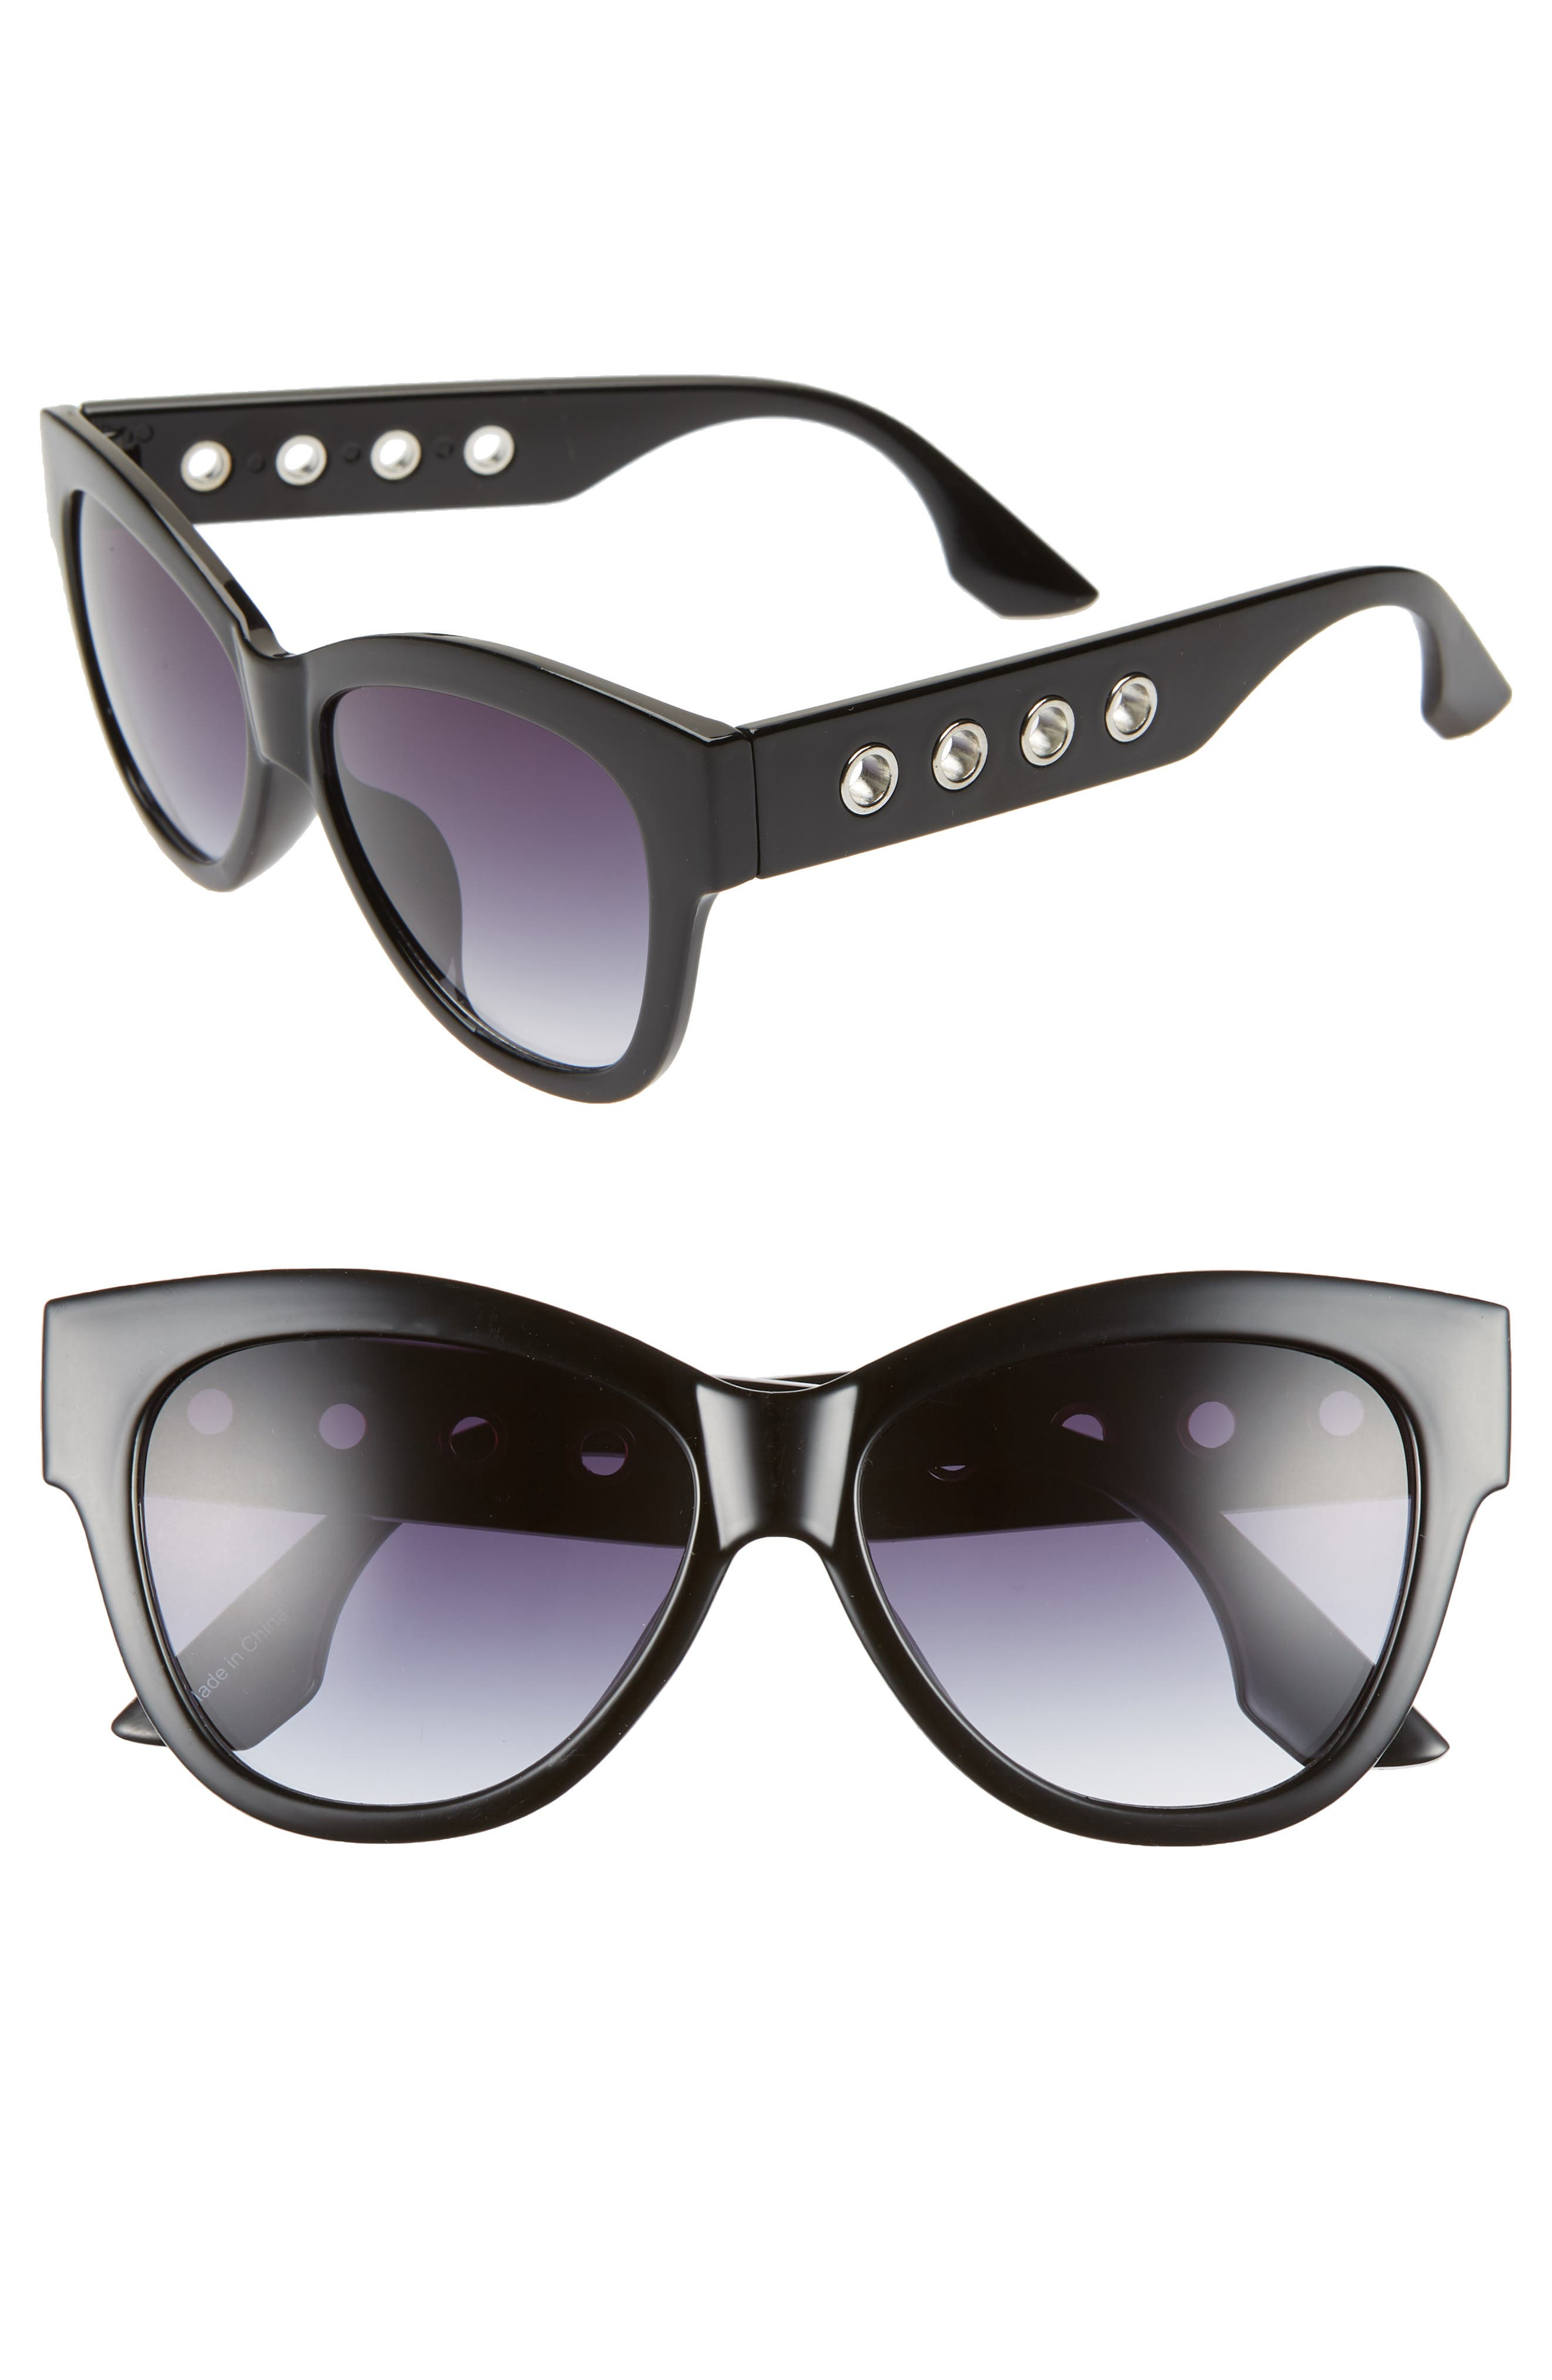 61mm Grommet Detail Square Sunglasses,                             Main thumbnail 1, color,                             BLACK/ SILVER